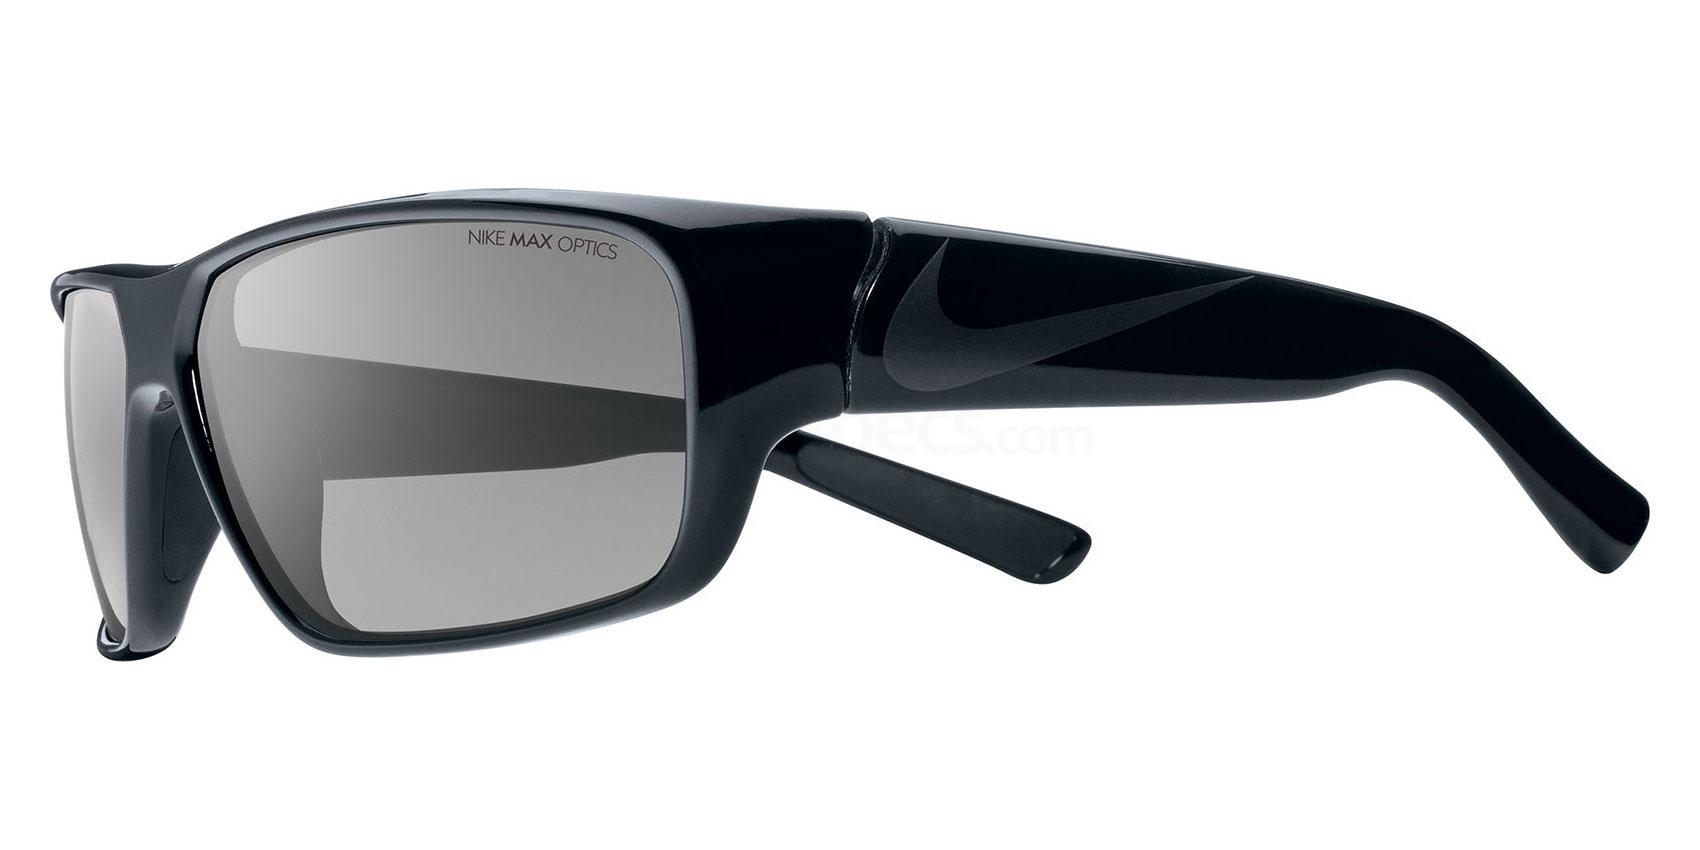 022 NIKE MERCURIAL 6.0 EV0778 Sunglasses, Nike